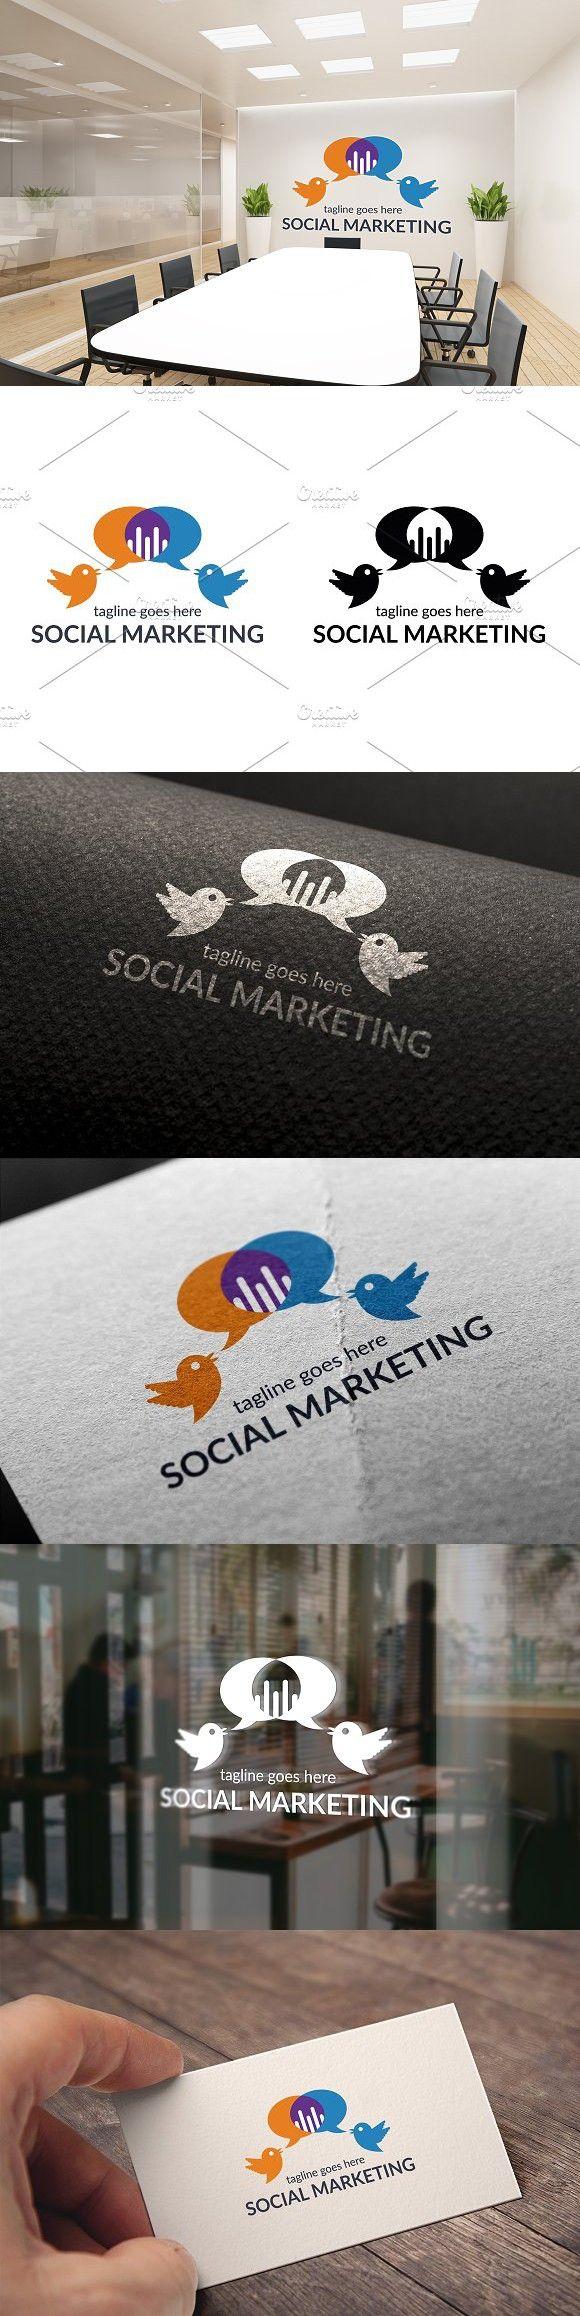 Social Marketing Logo Marketing Logo Social Marketing Web Graphic Design